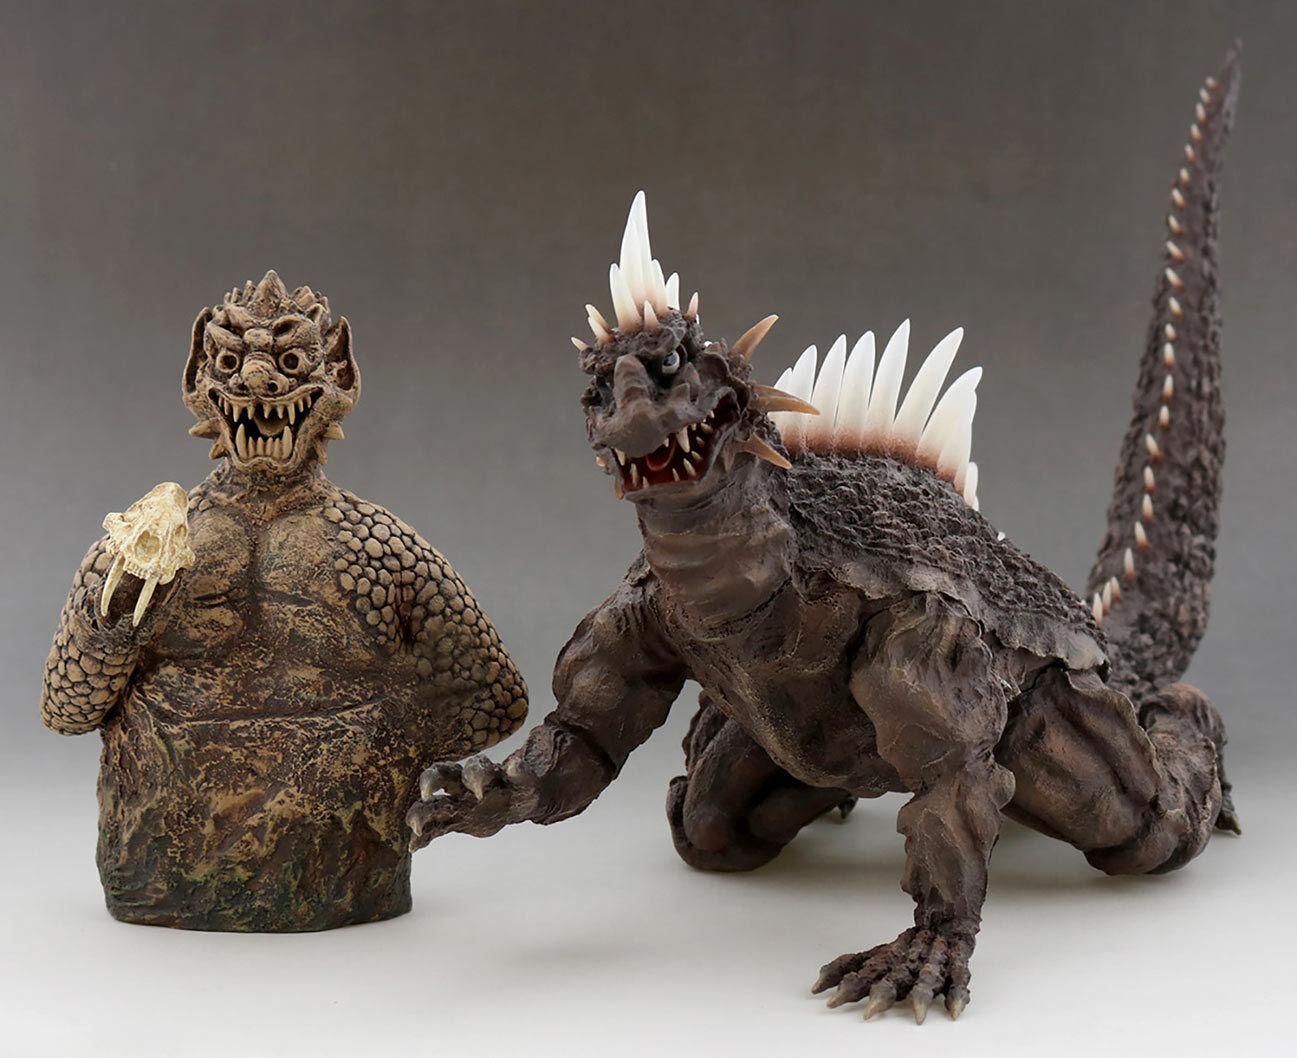 Japan Rare Toho 30cm Series Favorite Sculptors Line Varan Ric Toy Limited ver.